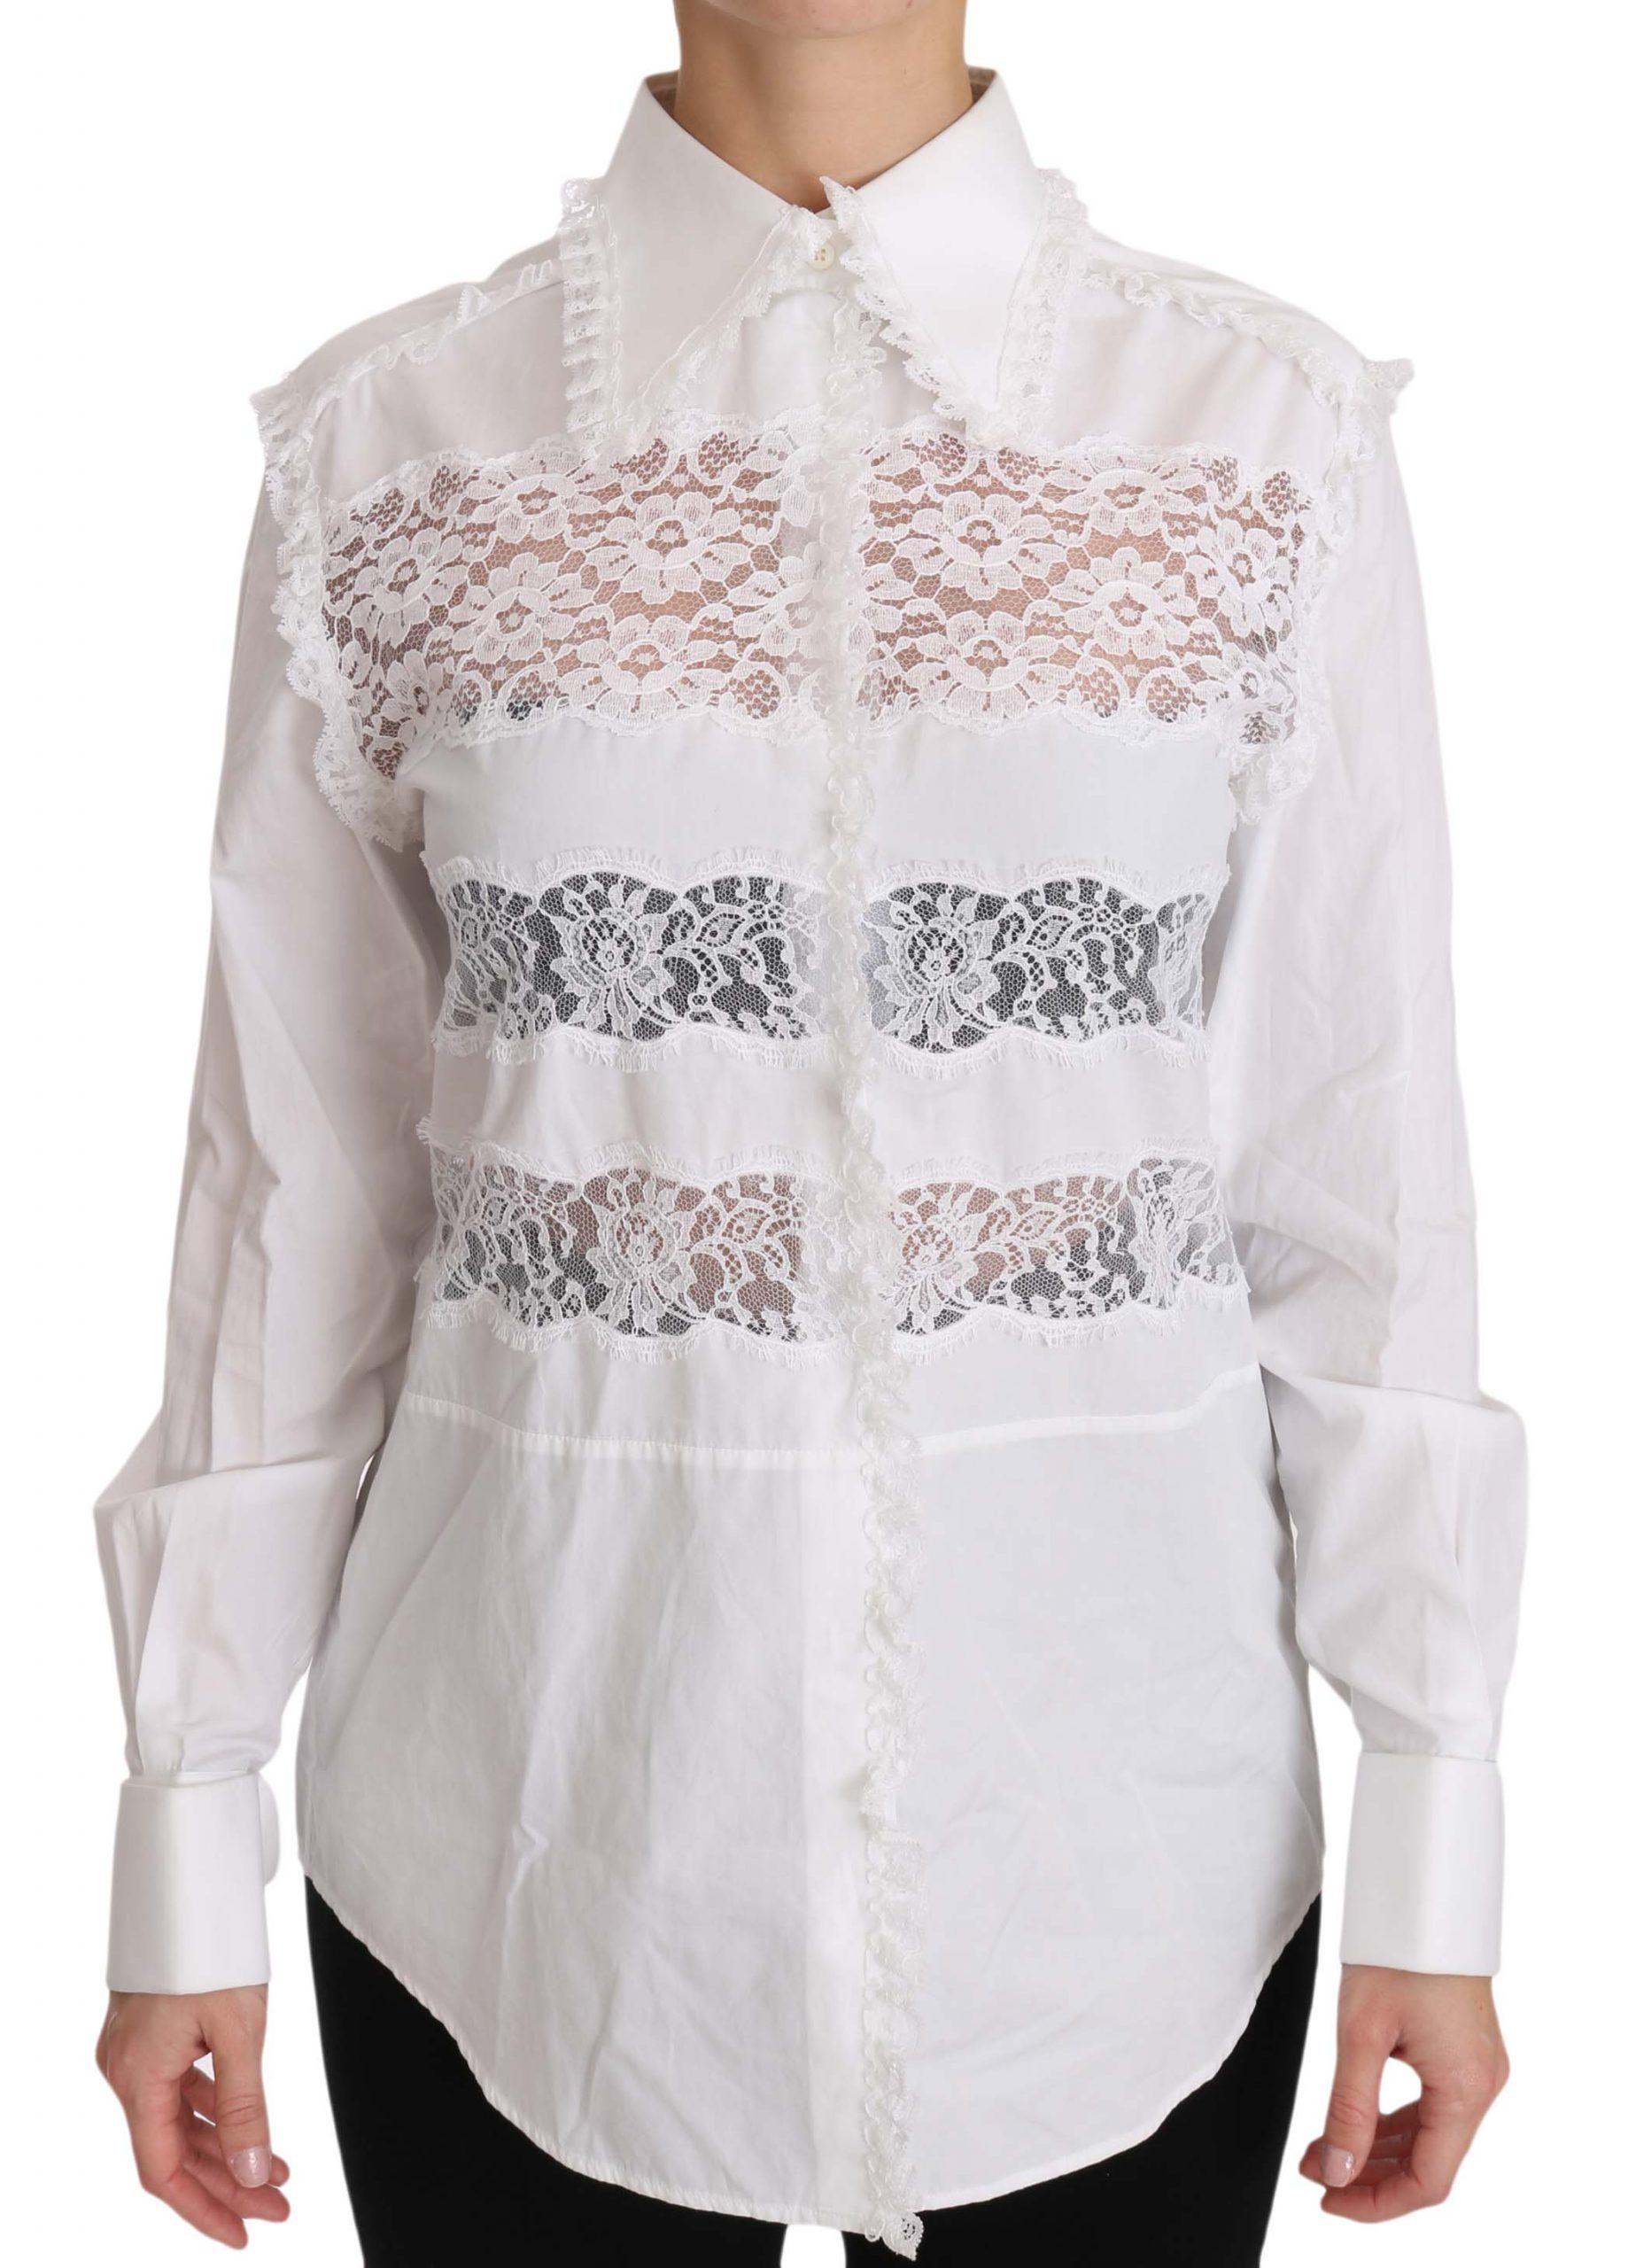 Dolce & Gabbana Women's Frill Lace Inset Poplin Shirt White TSH3218 - IT40|S